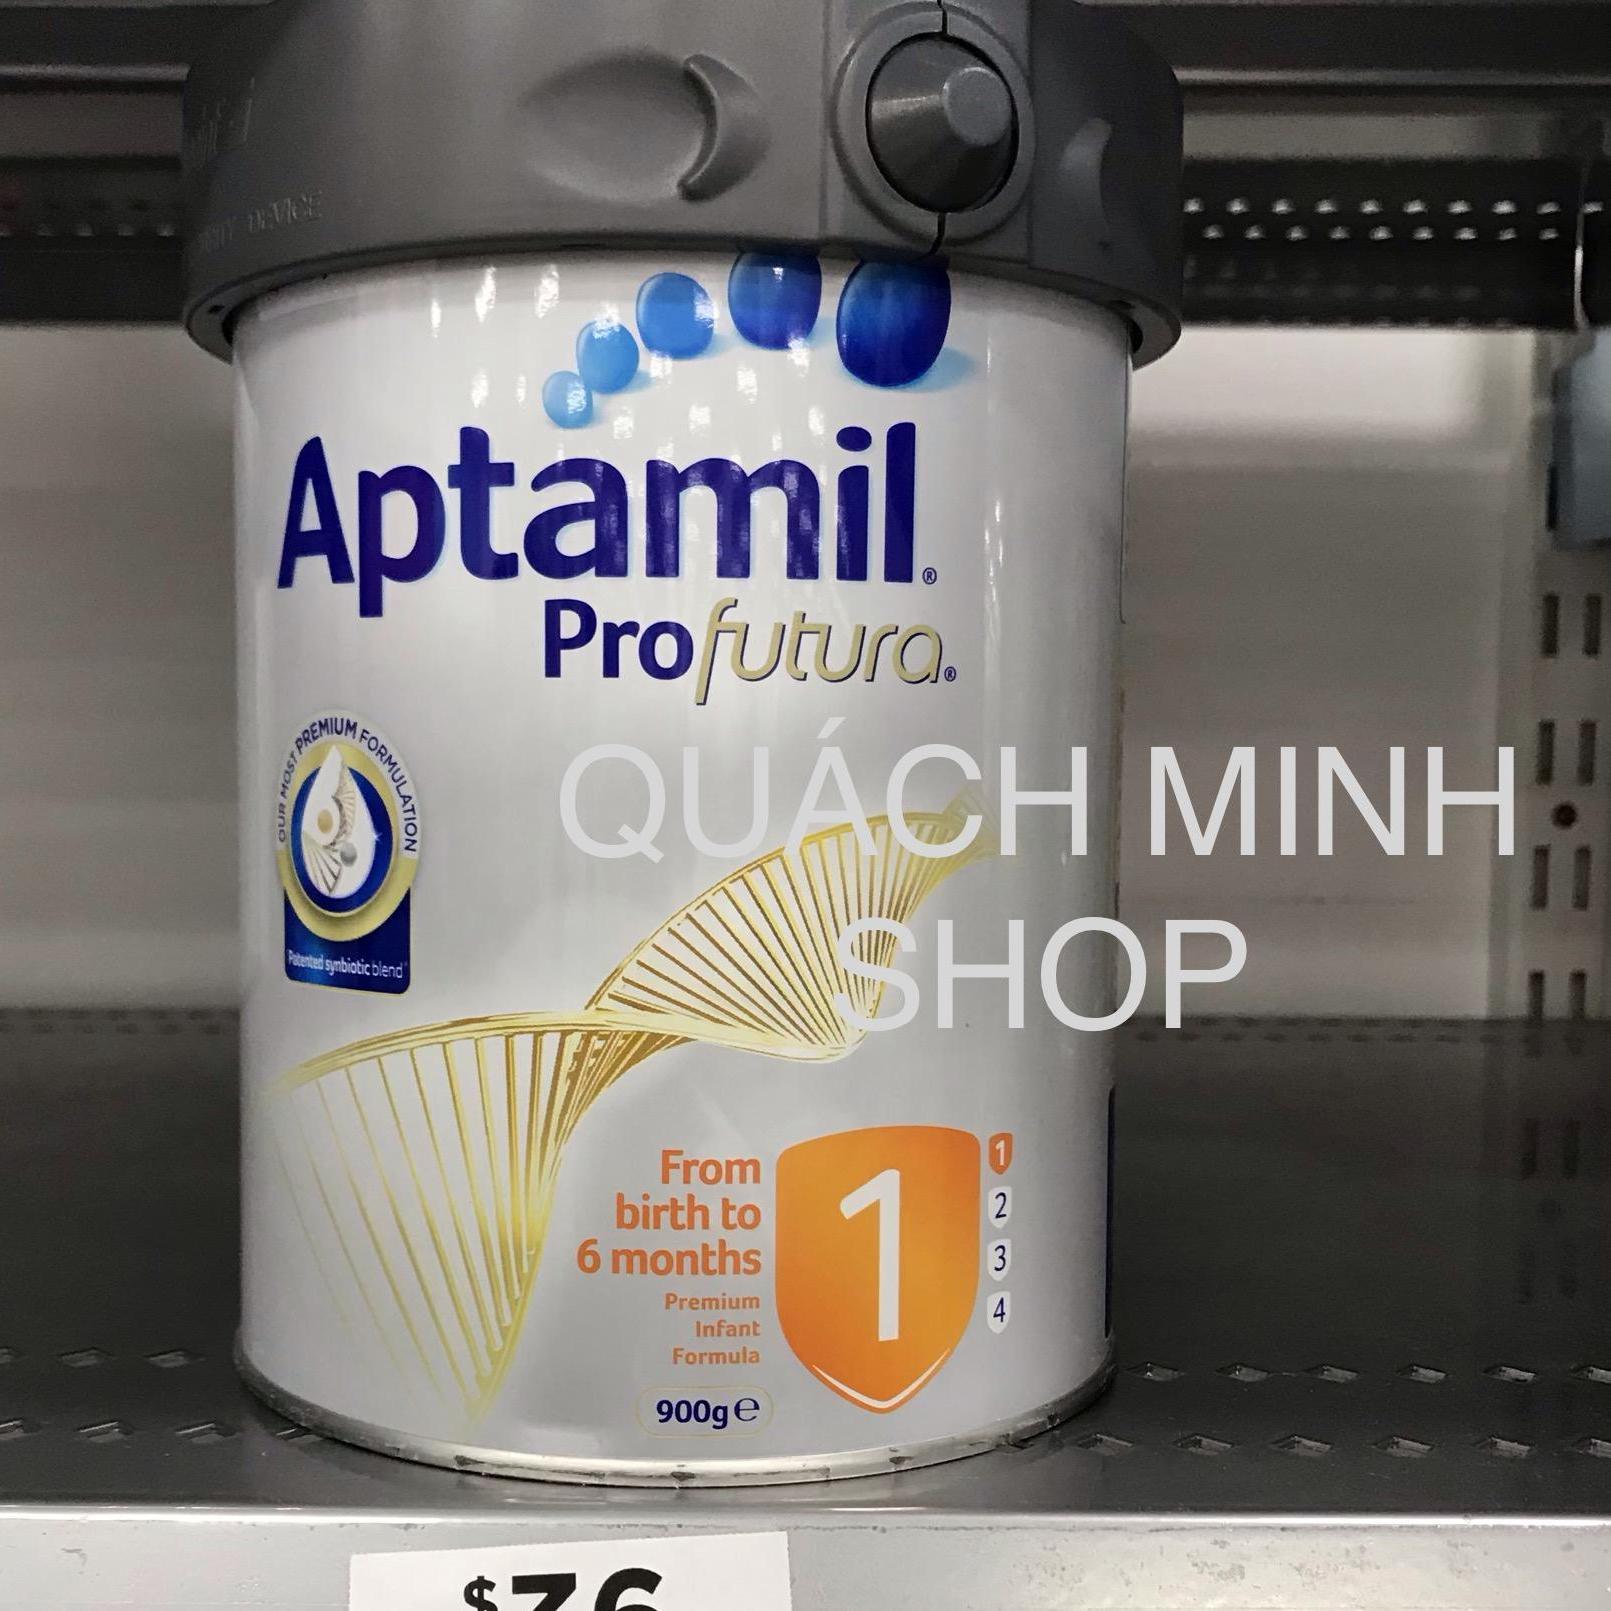 Sữa Aptamil Profutura số 2 hàng Úc